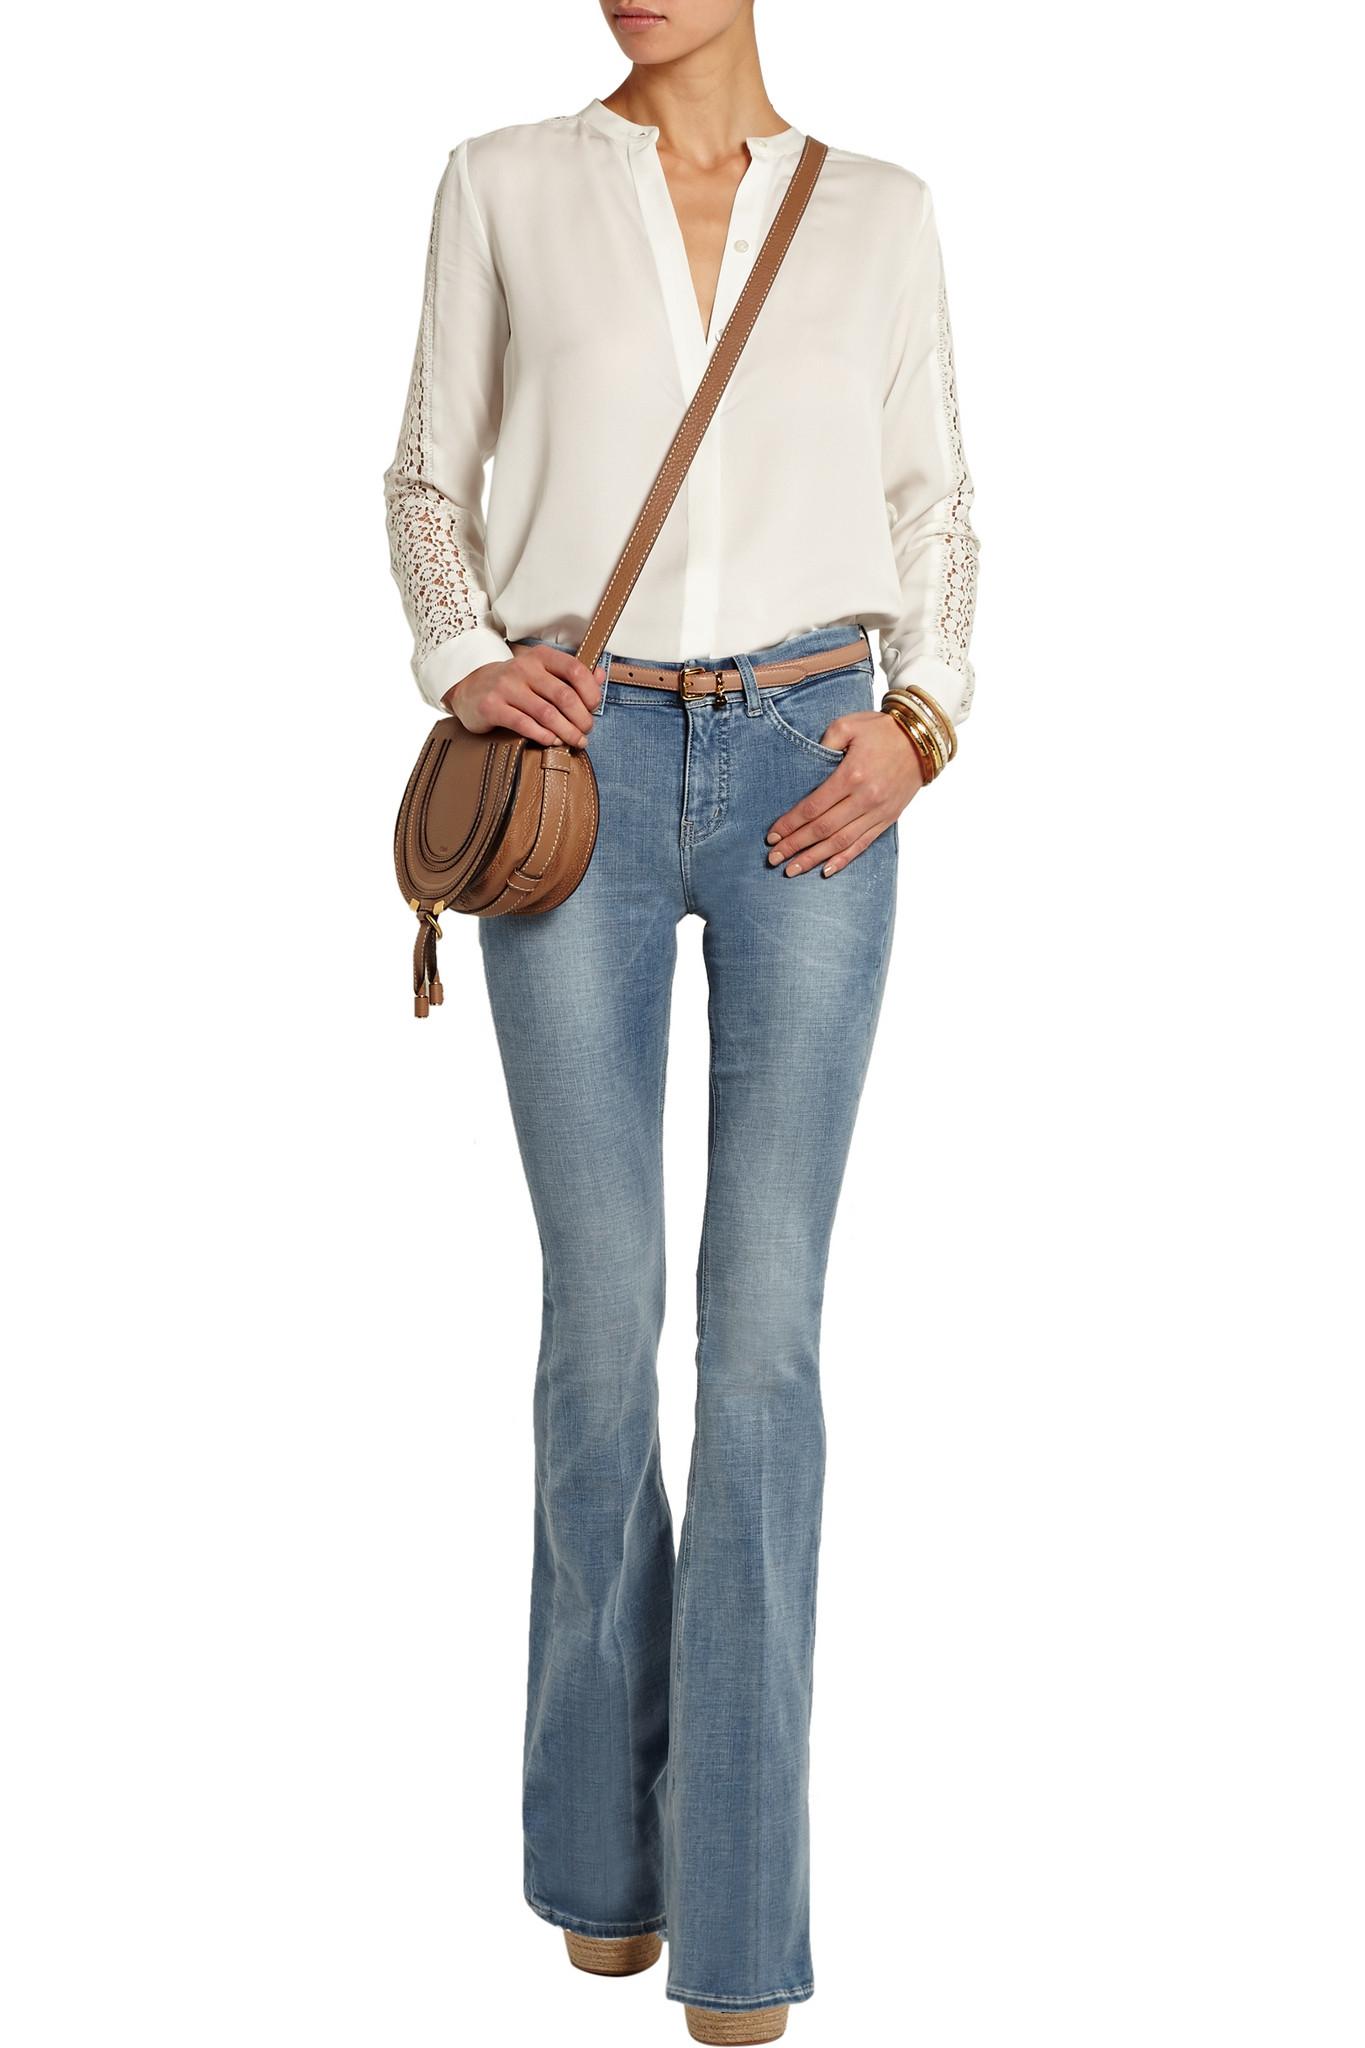 michael kors silk crepe blouse women 39 s lace blouses. Black Bedroom Furniture Sets. Home Design Ideas